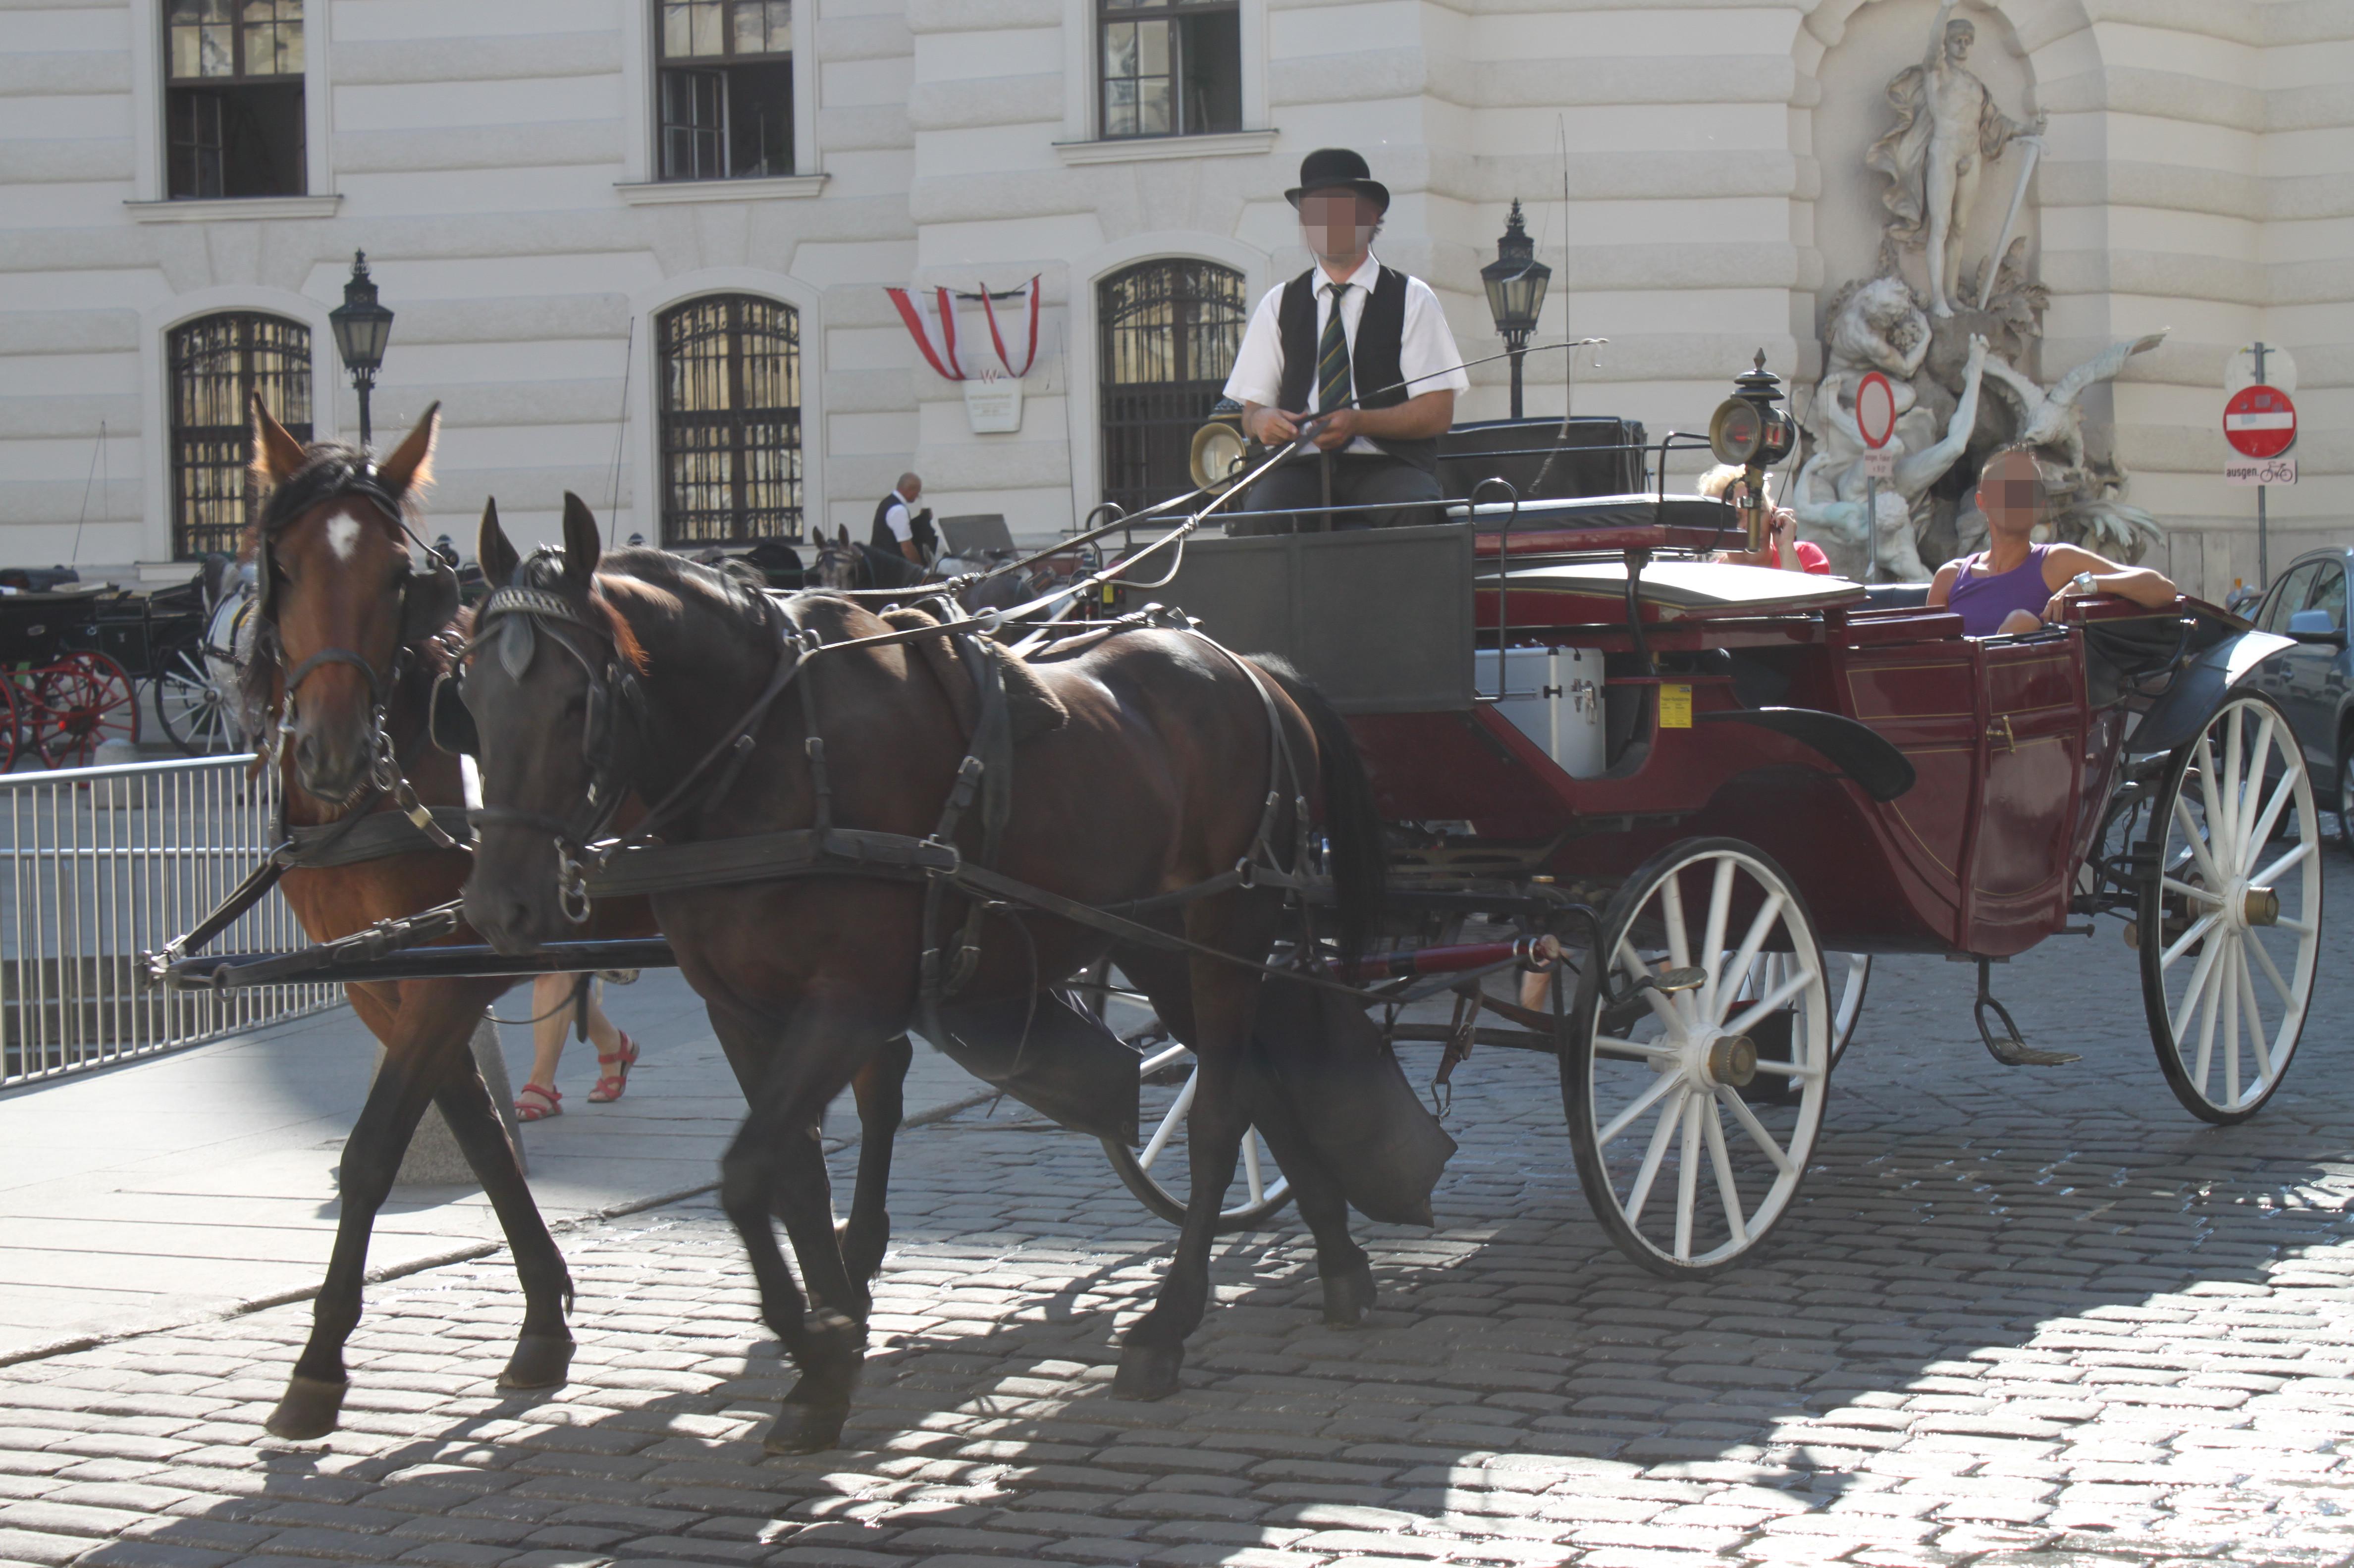 Fiakerpferde in Wiens Innenstadt